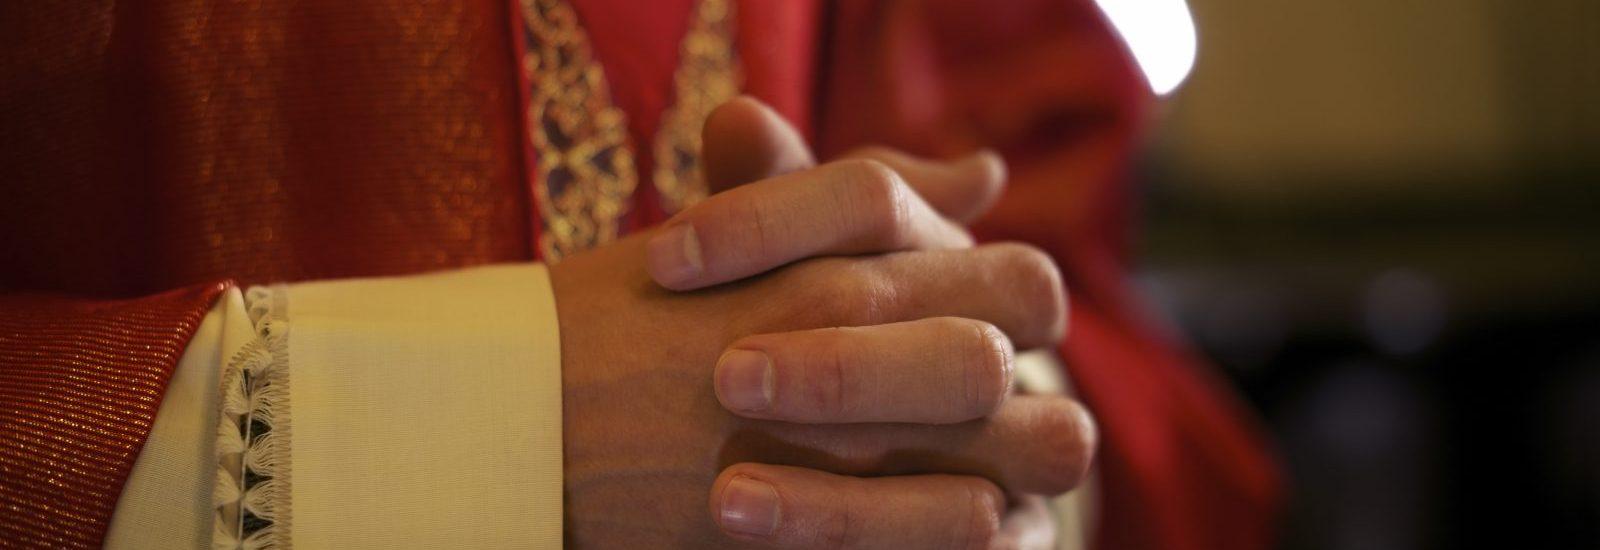 Priester handen gevouwen